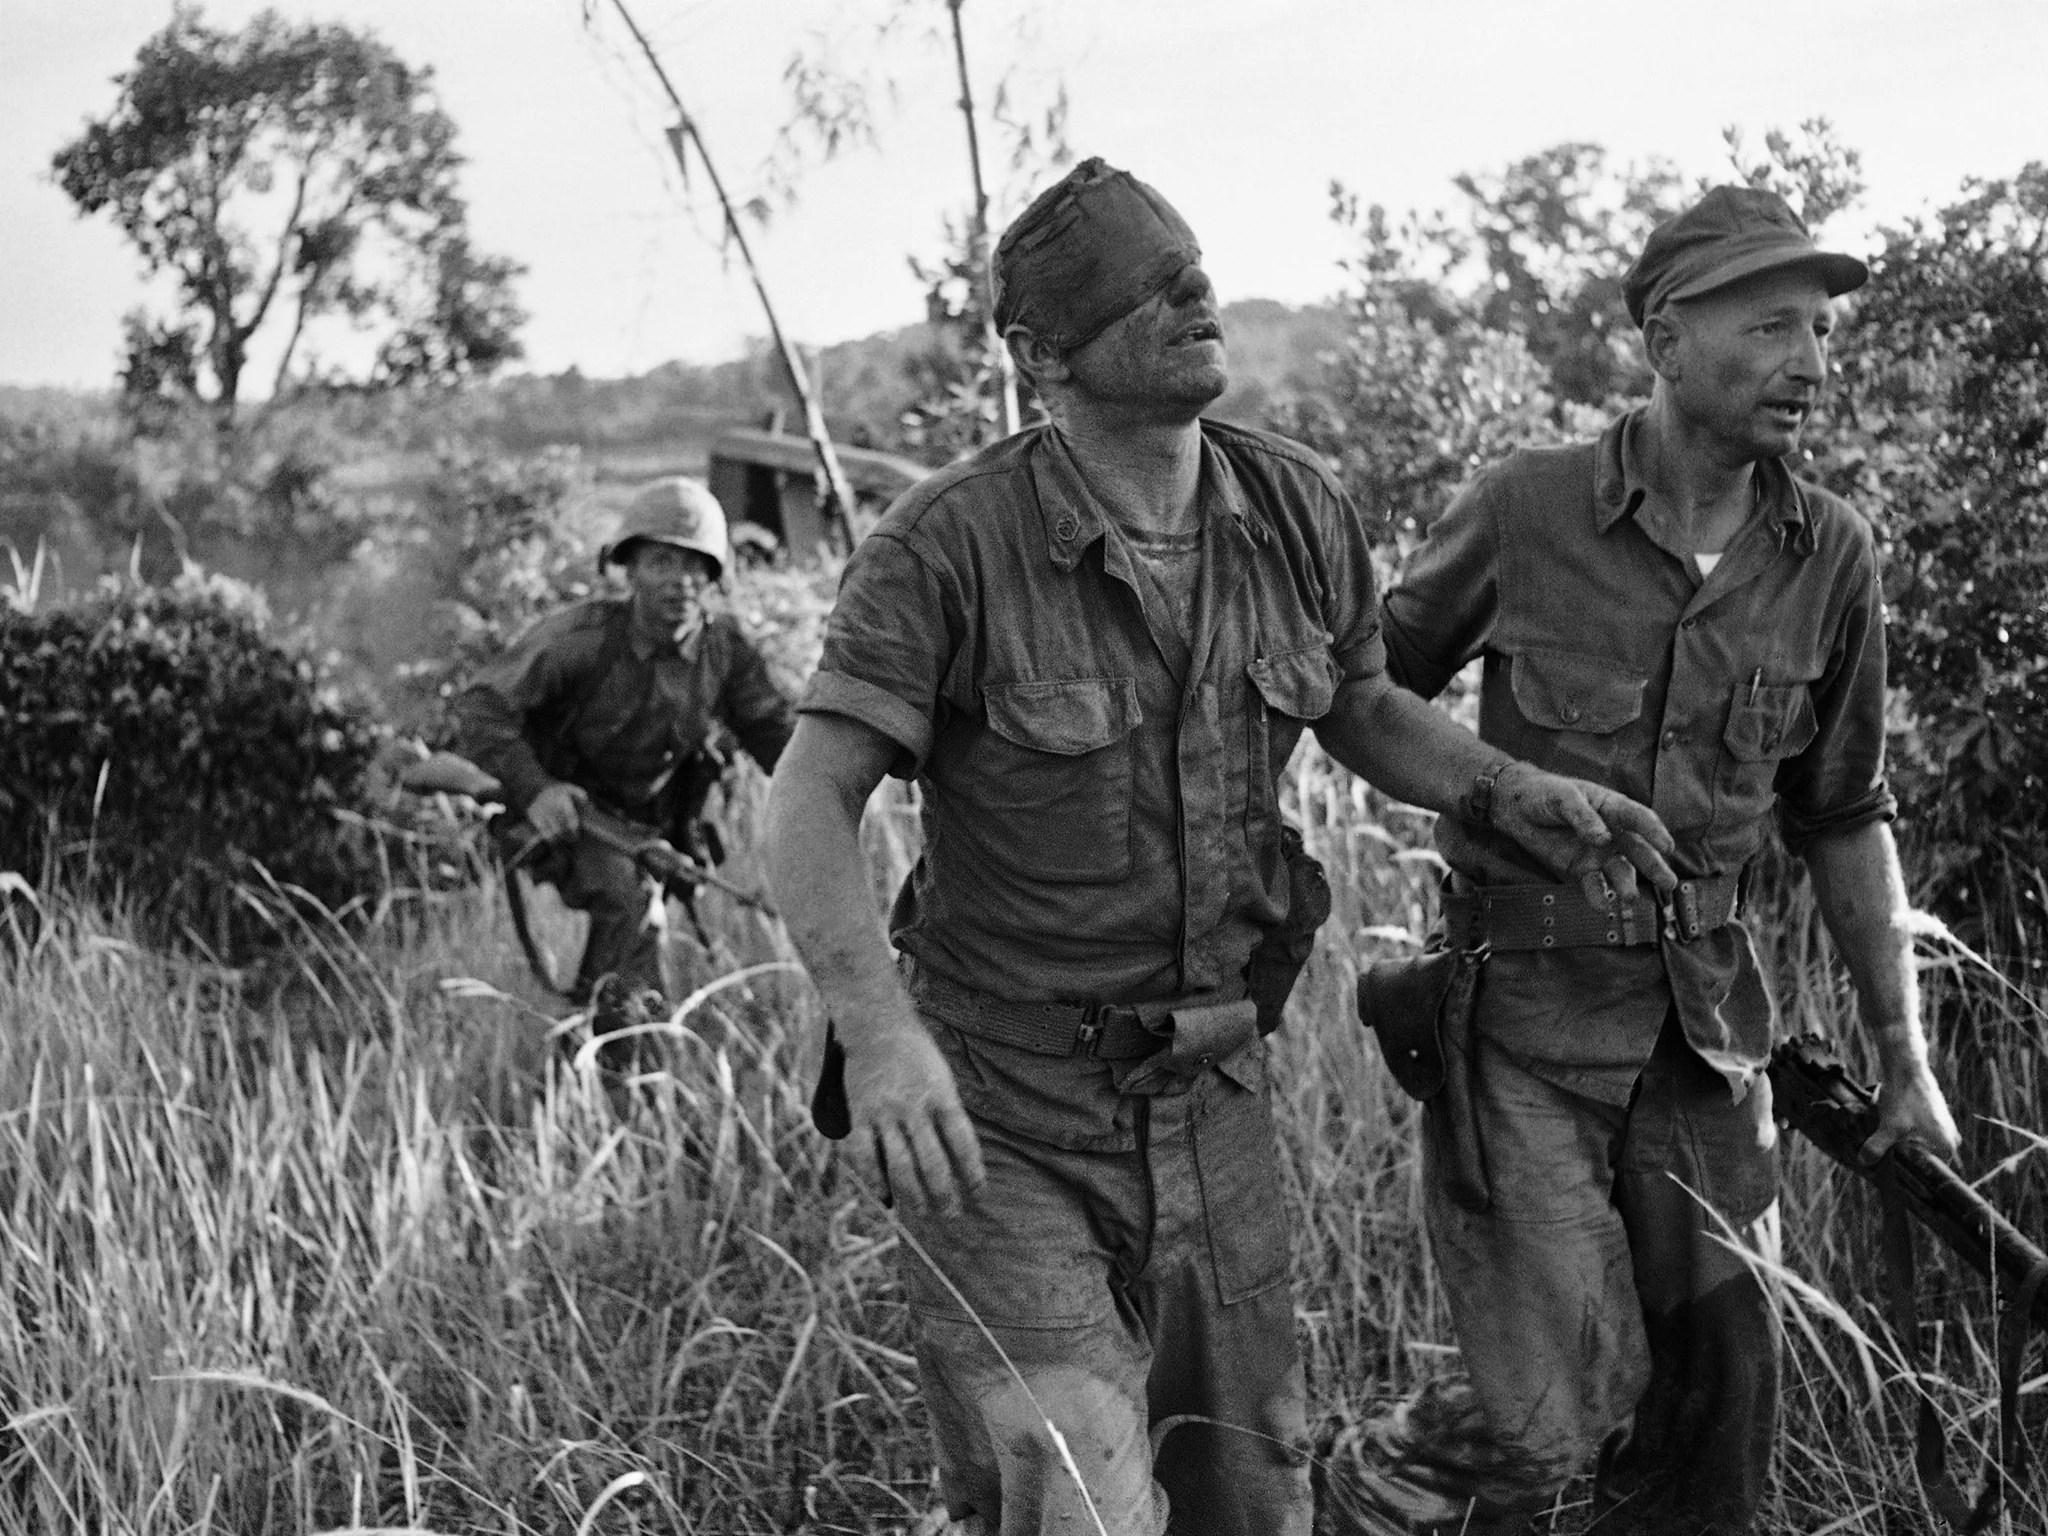 The Vietnam War 40 Years On